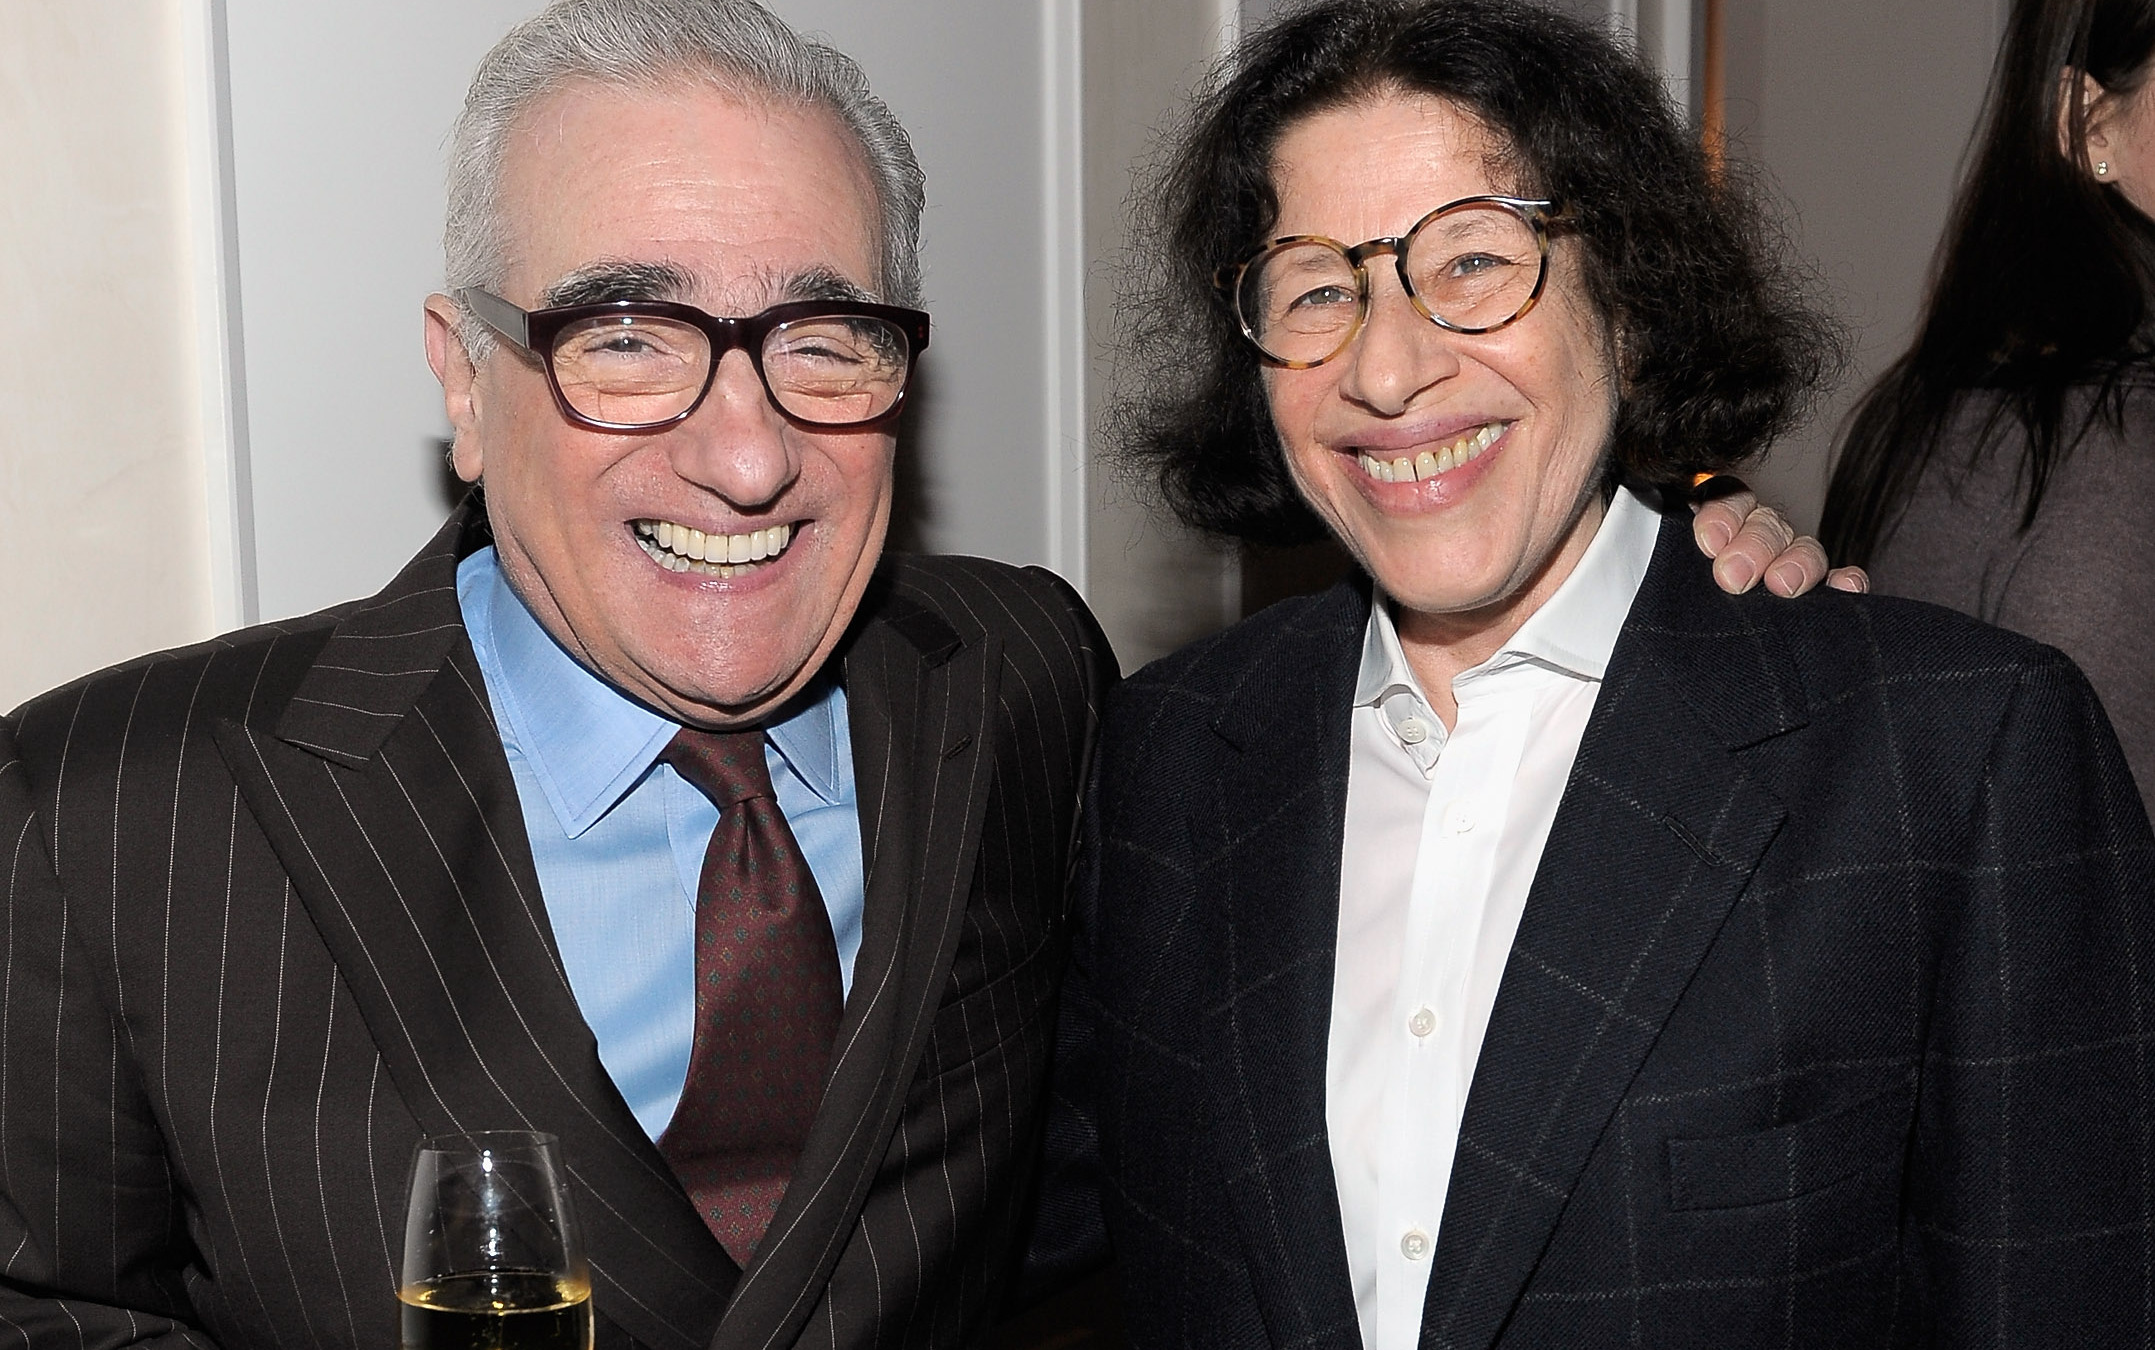 Martin Scorsese y Fran Lebowitz